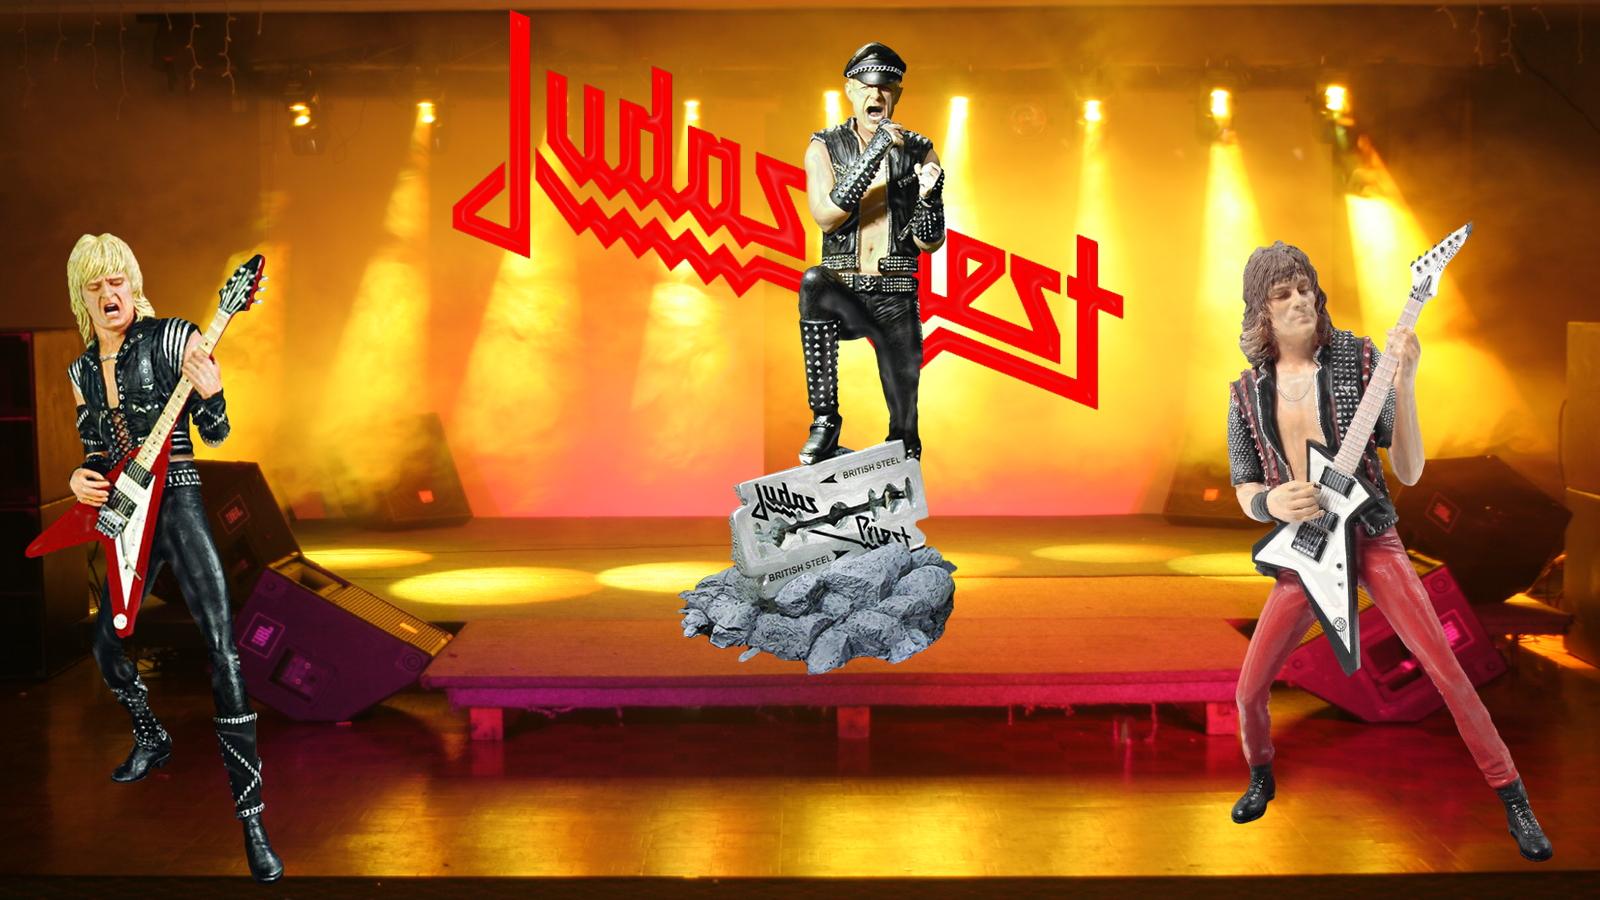 Judas Priest quote #2